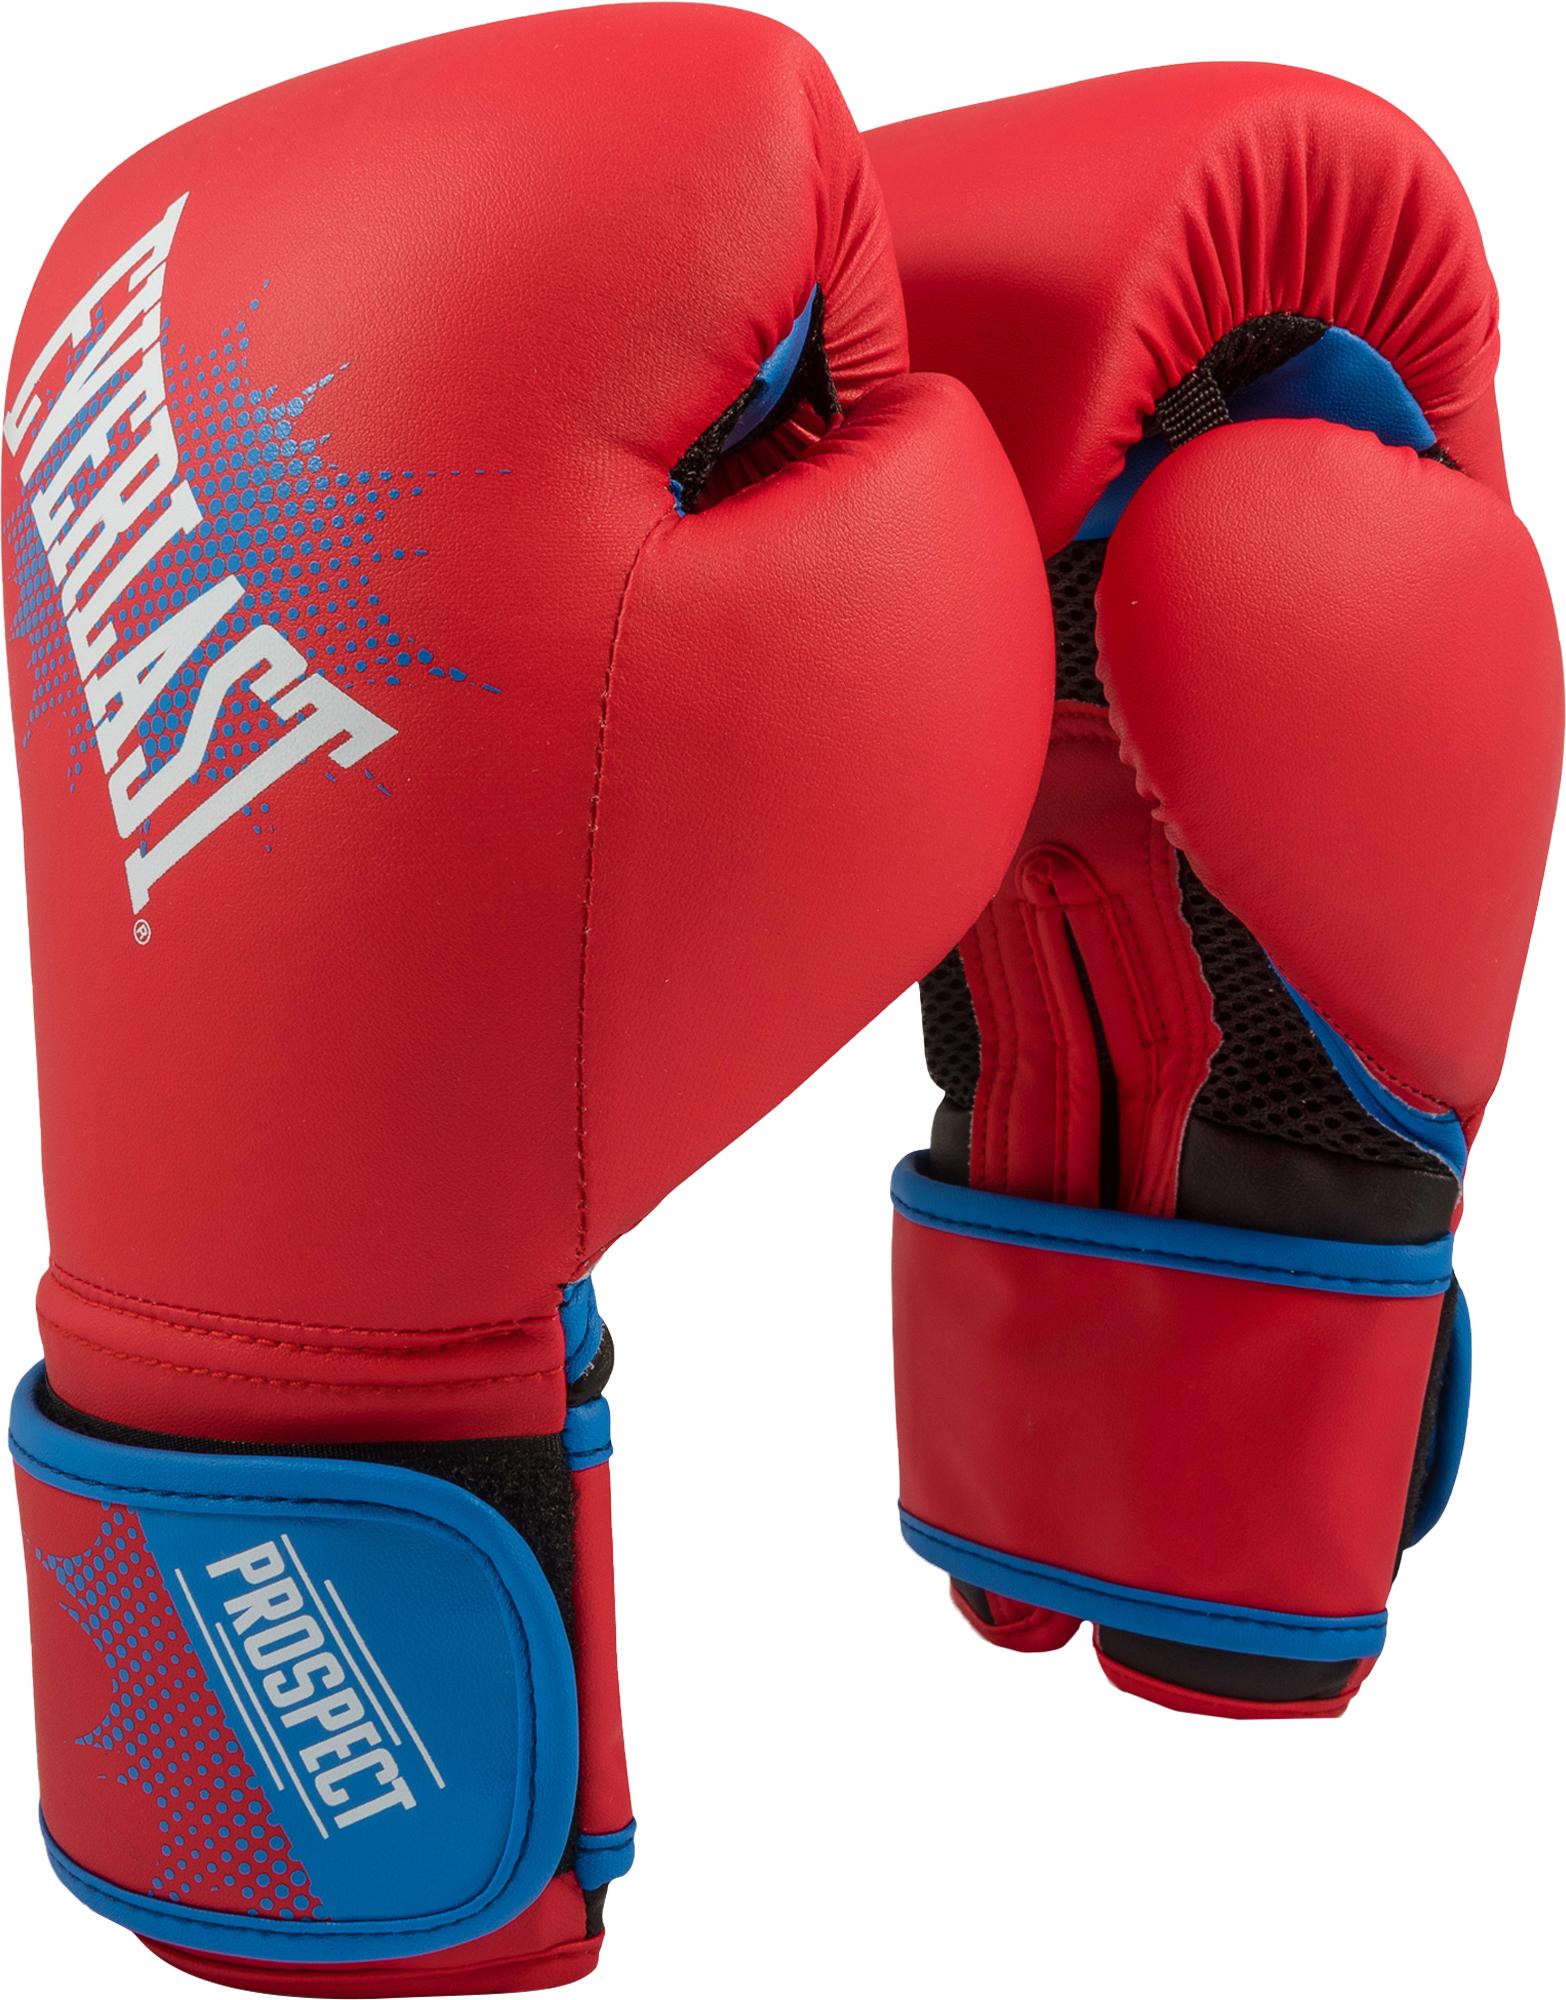 Everlast Перчатки боксерские детские Prospect, размер 8 oz